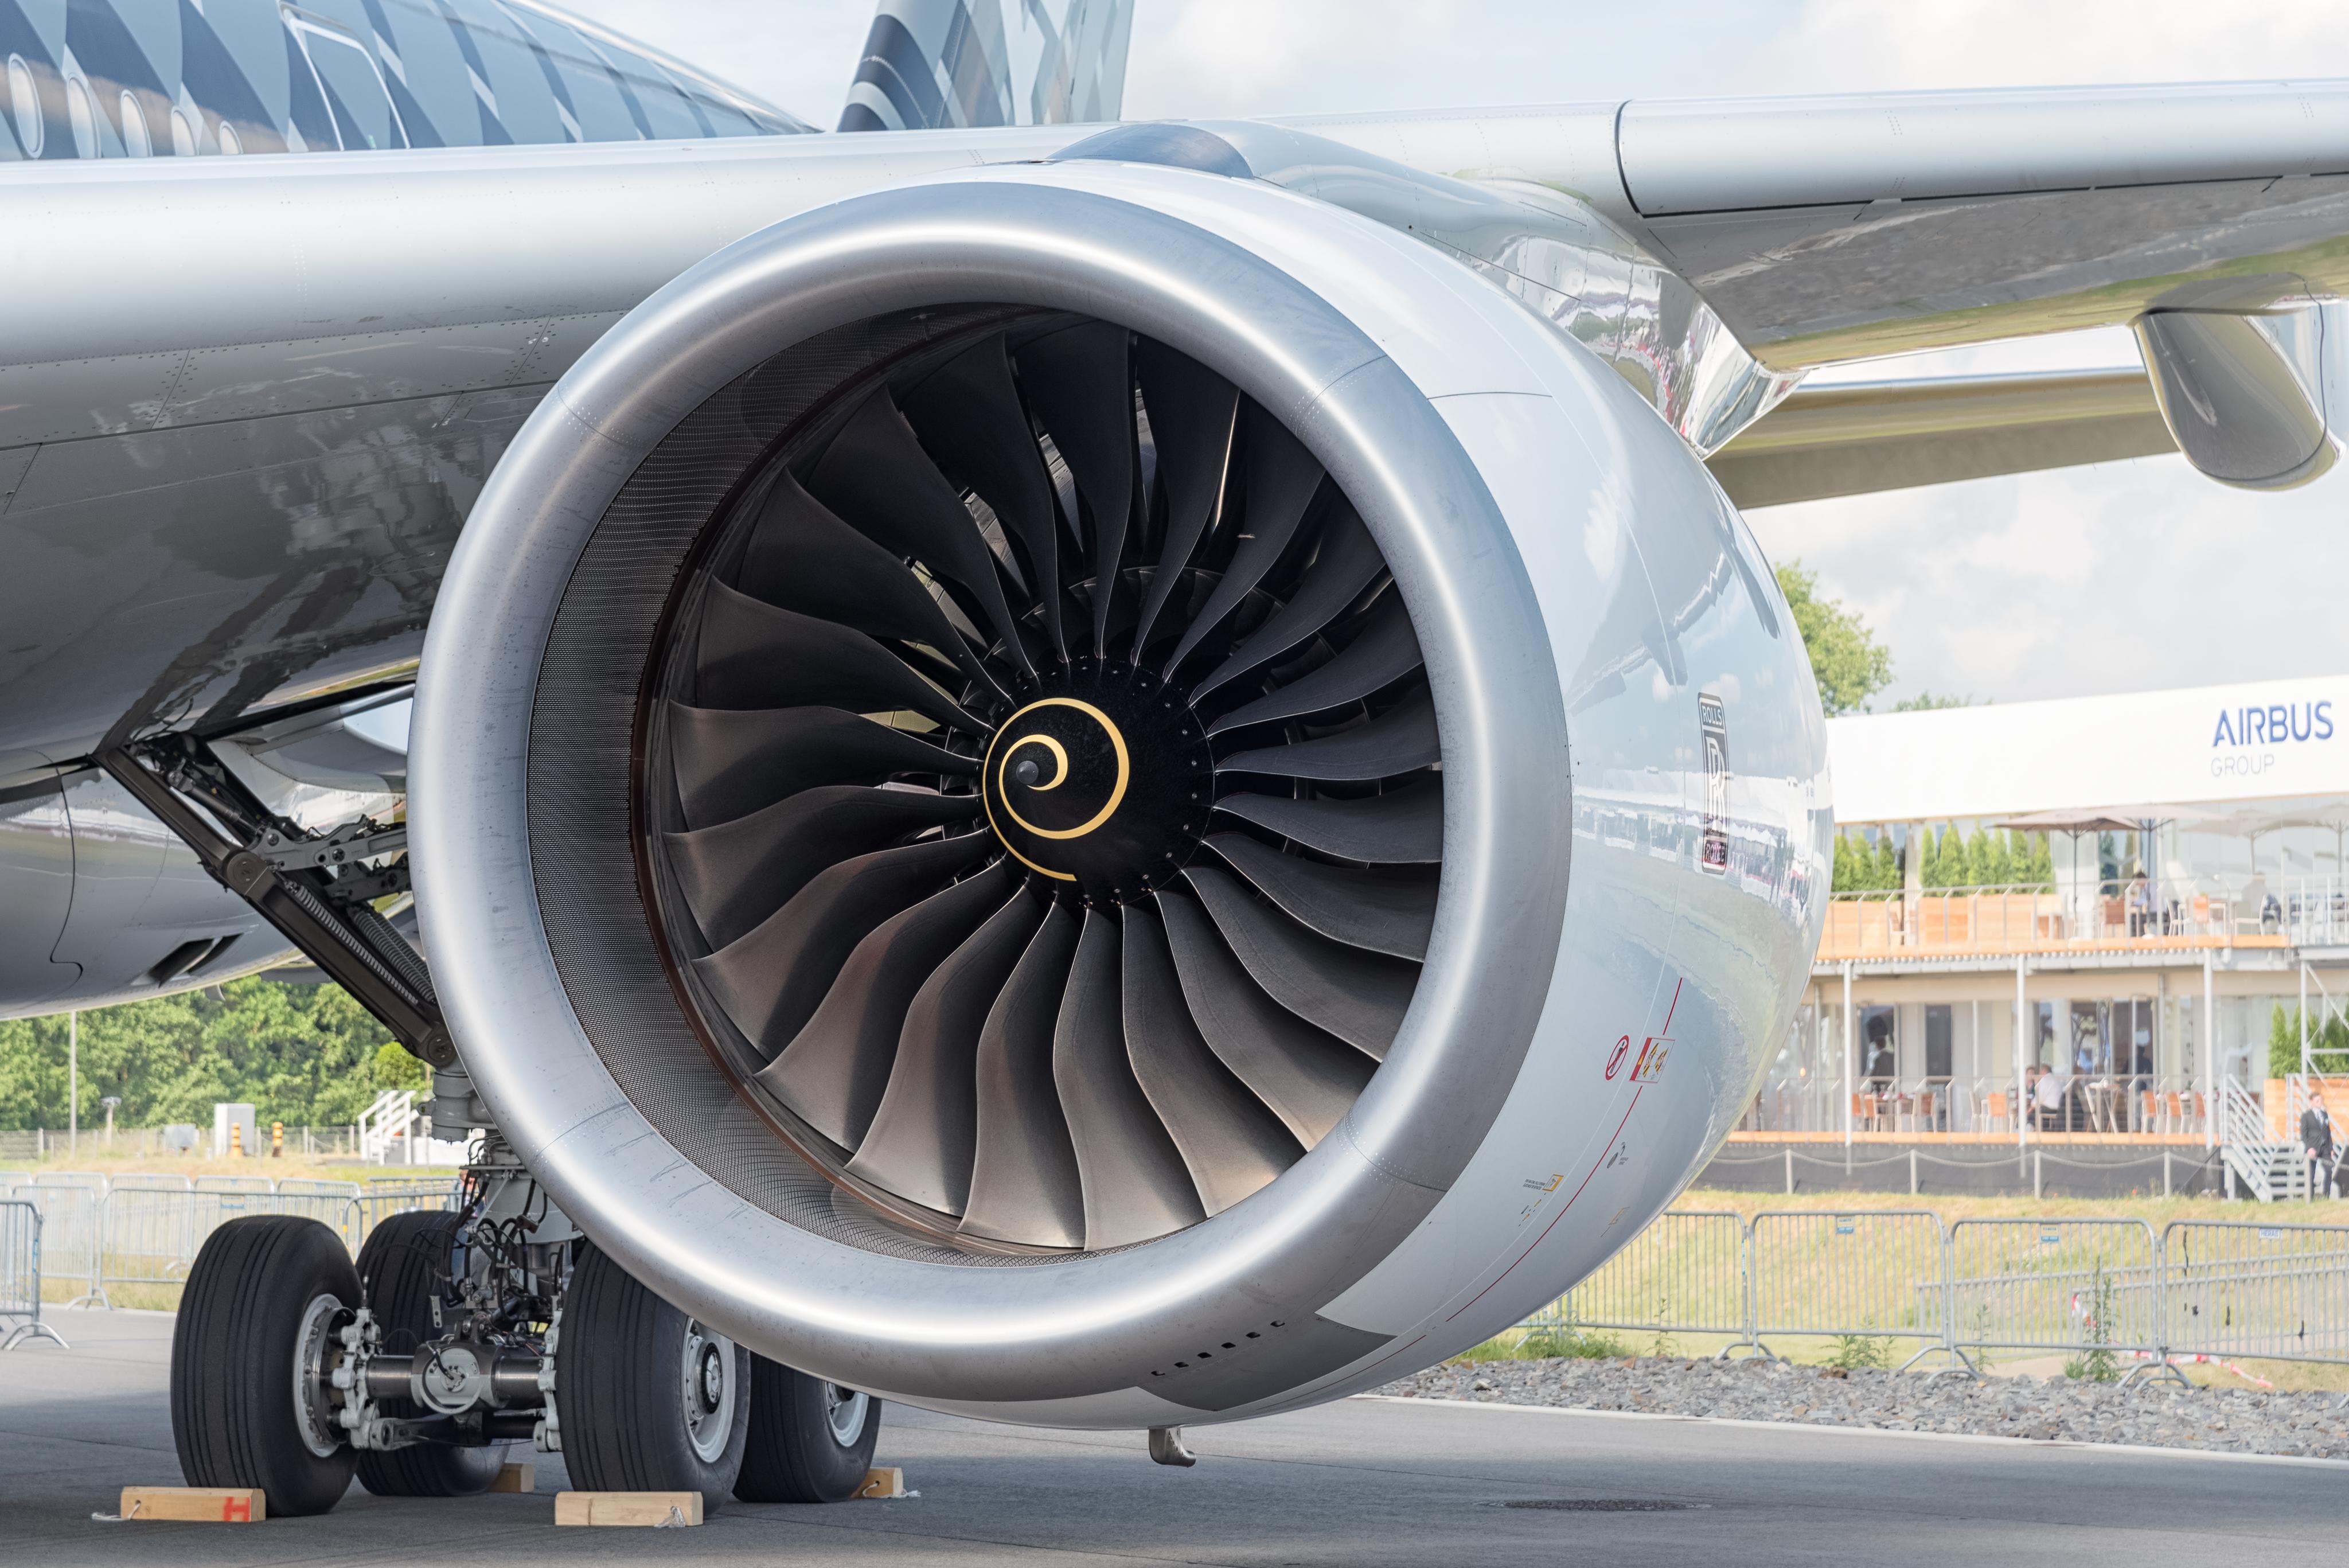 Rolls Royce 787 Trent 1000 Rolls Royce Rolls Royce